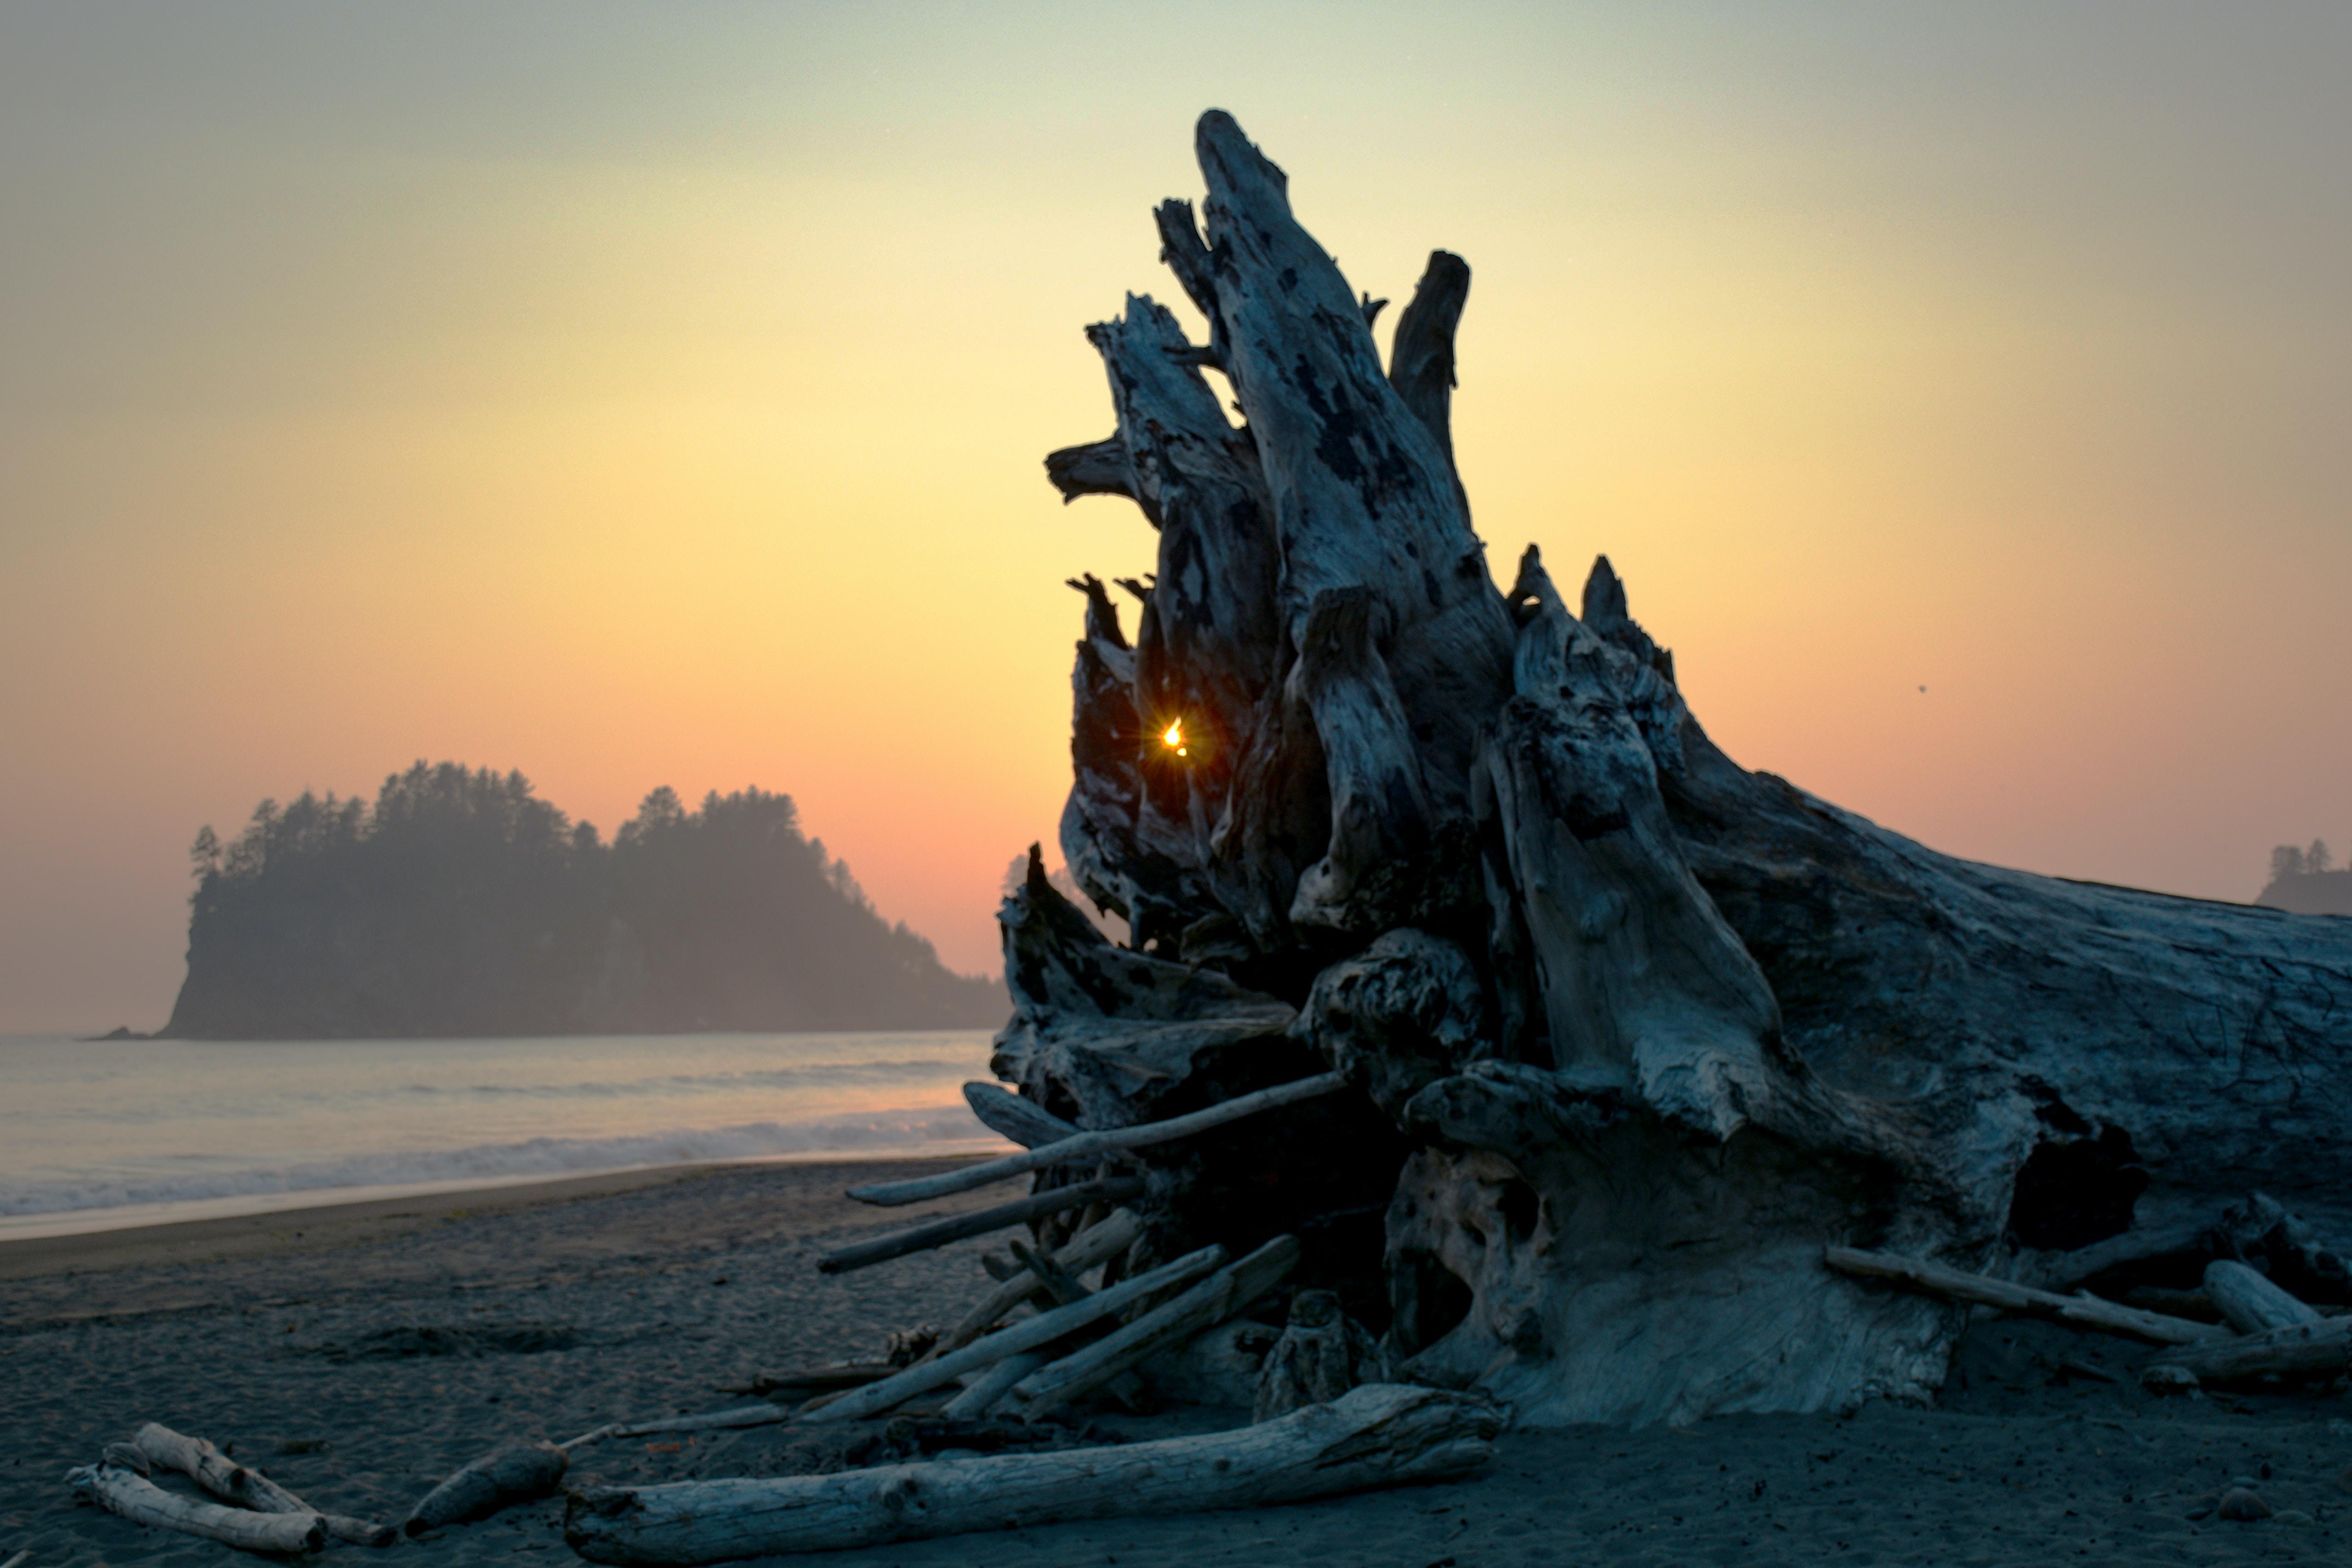 gray driftwood on seashore near body of water